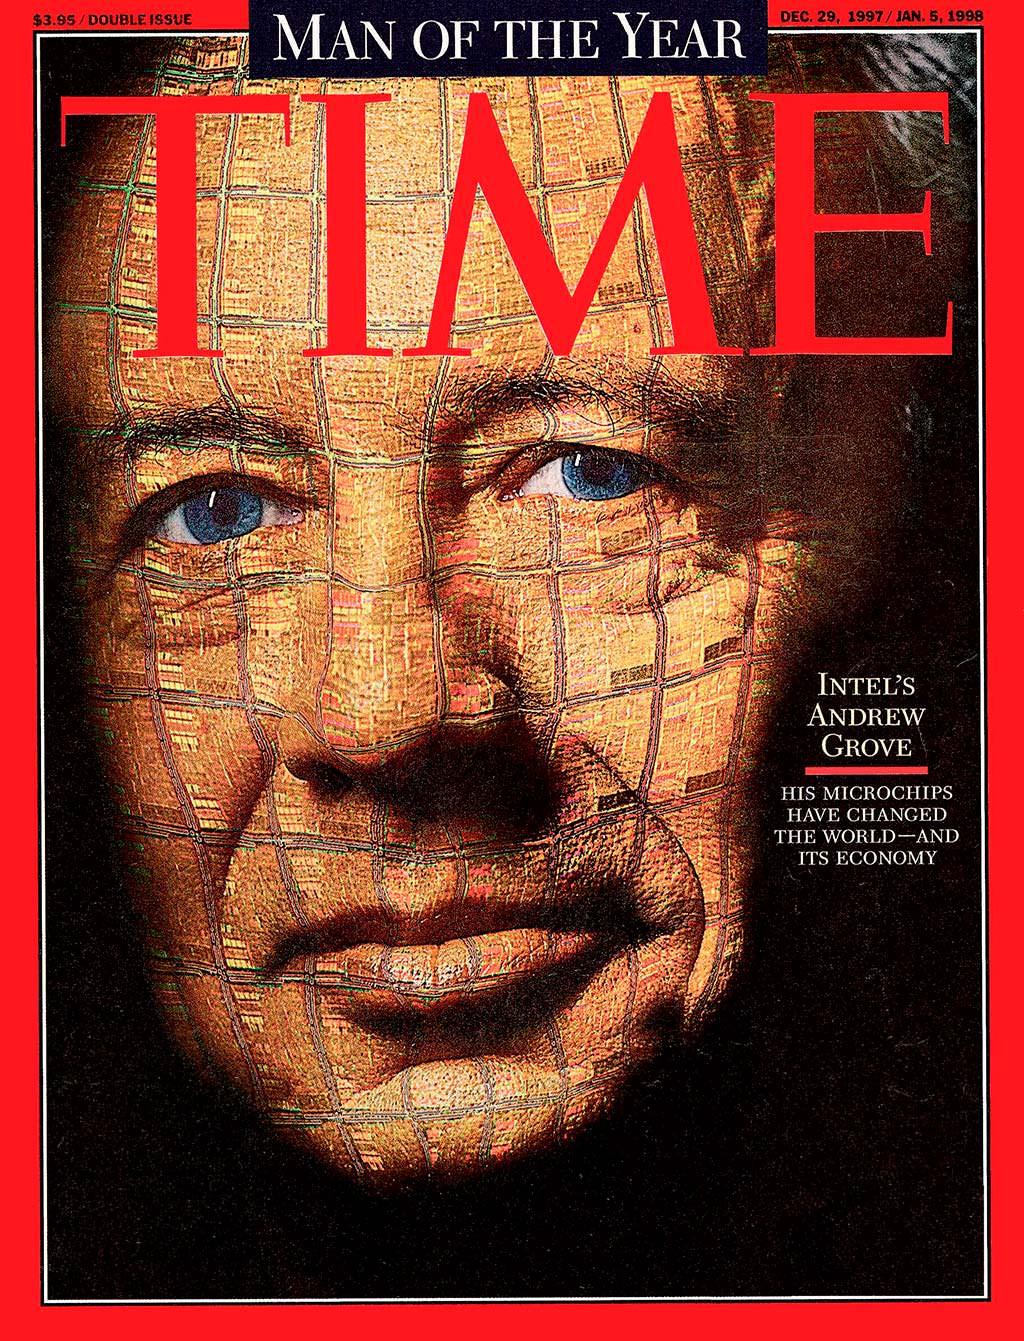 1997 год. Гендиректор Intel Эндрю Гроув на обложке Time